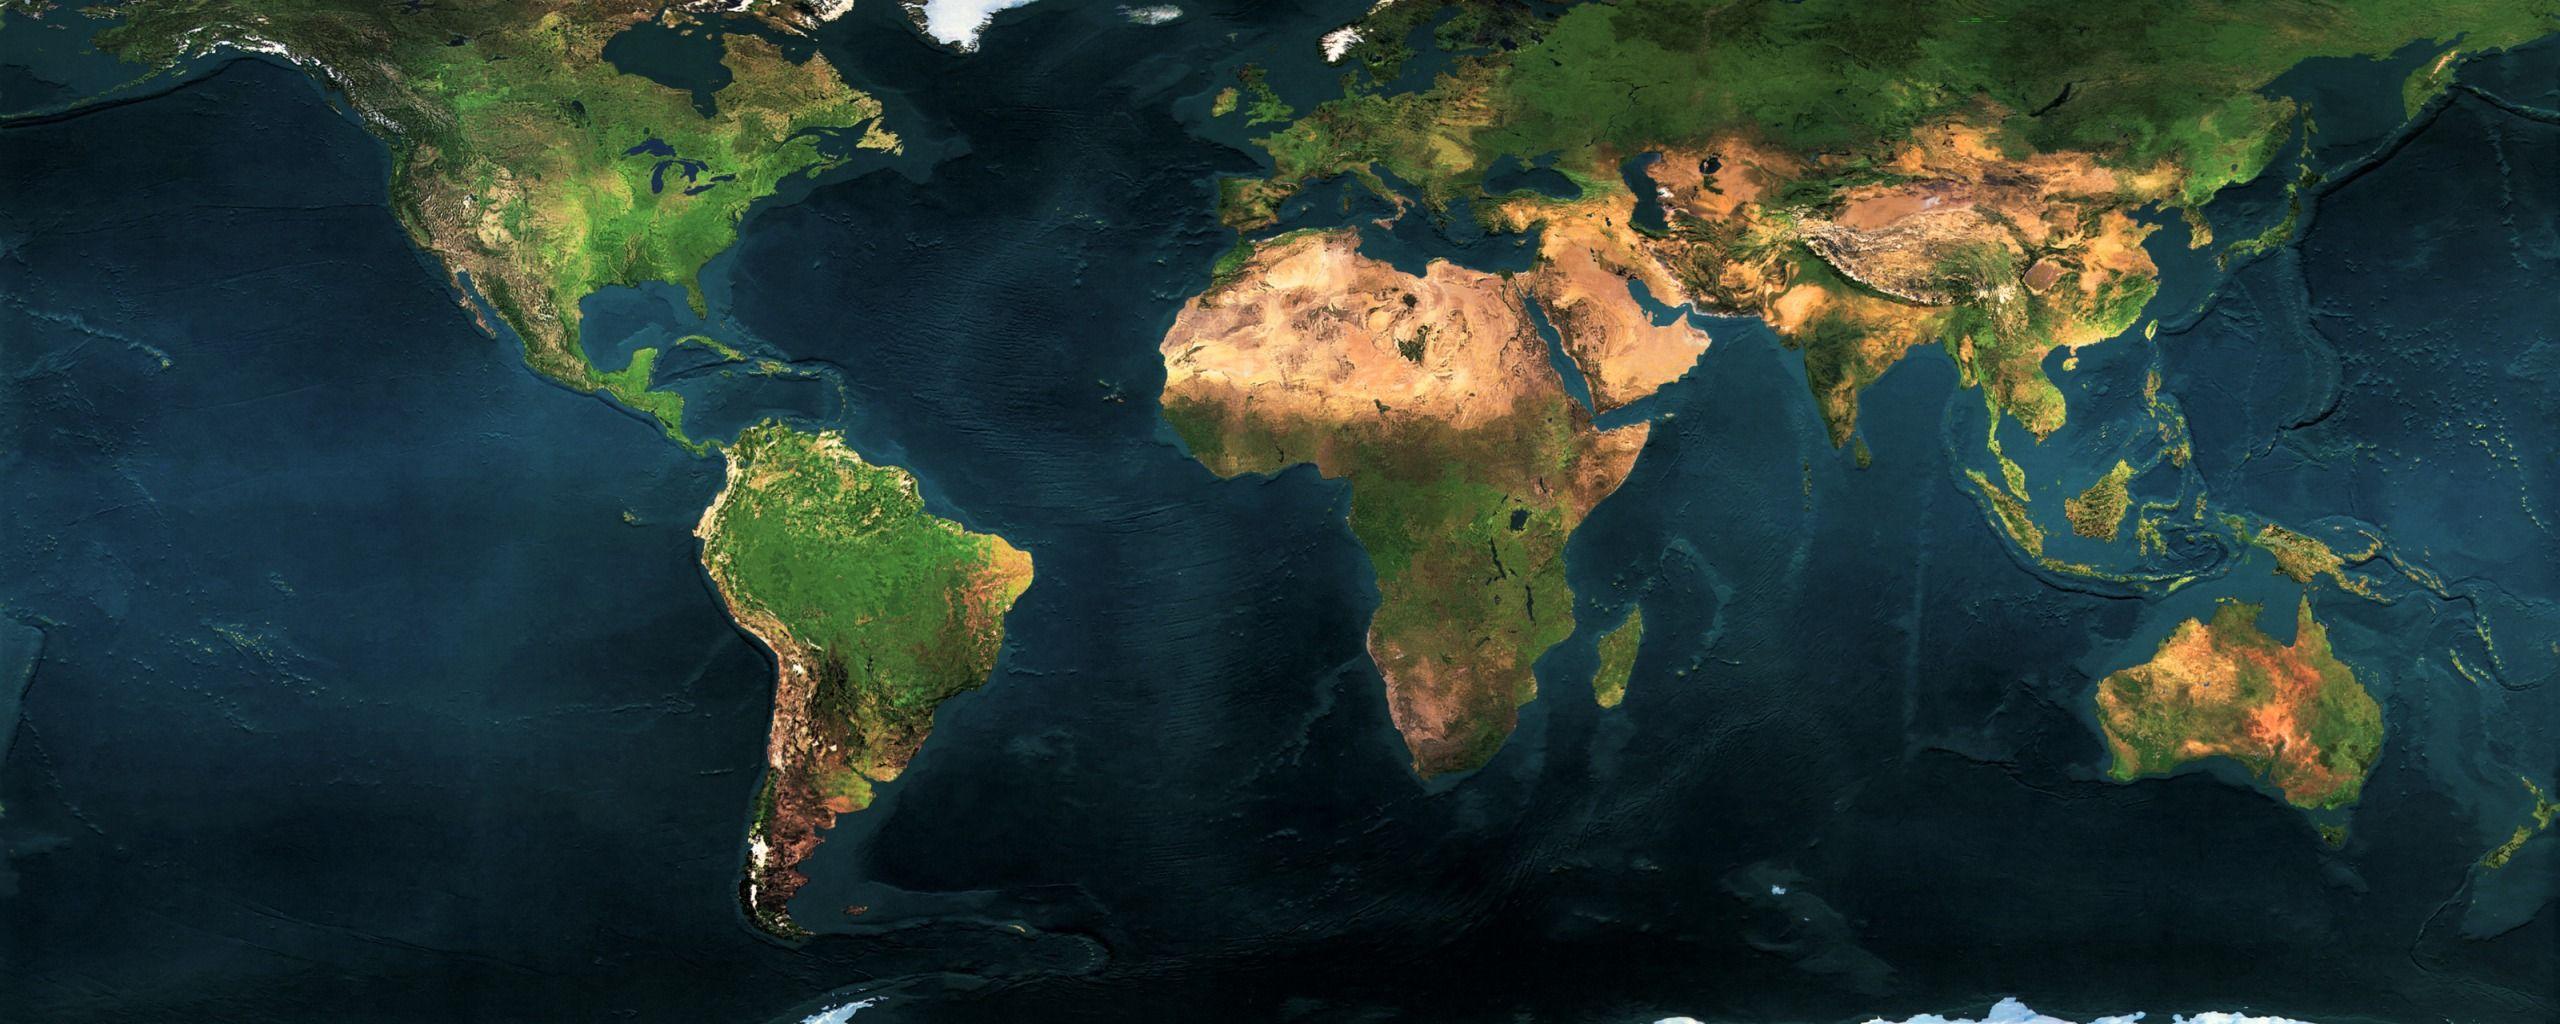 Satellite World Map Via WallBasecc IMaps Pinterest - World map satellite hd